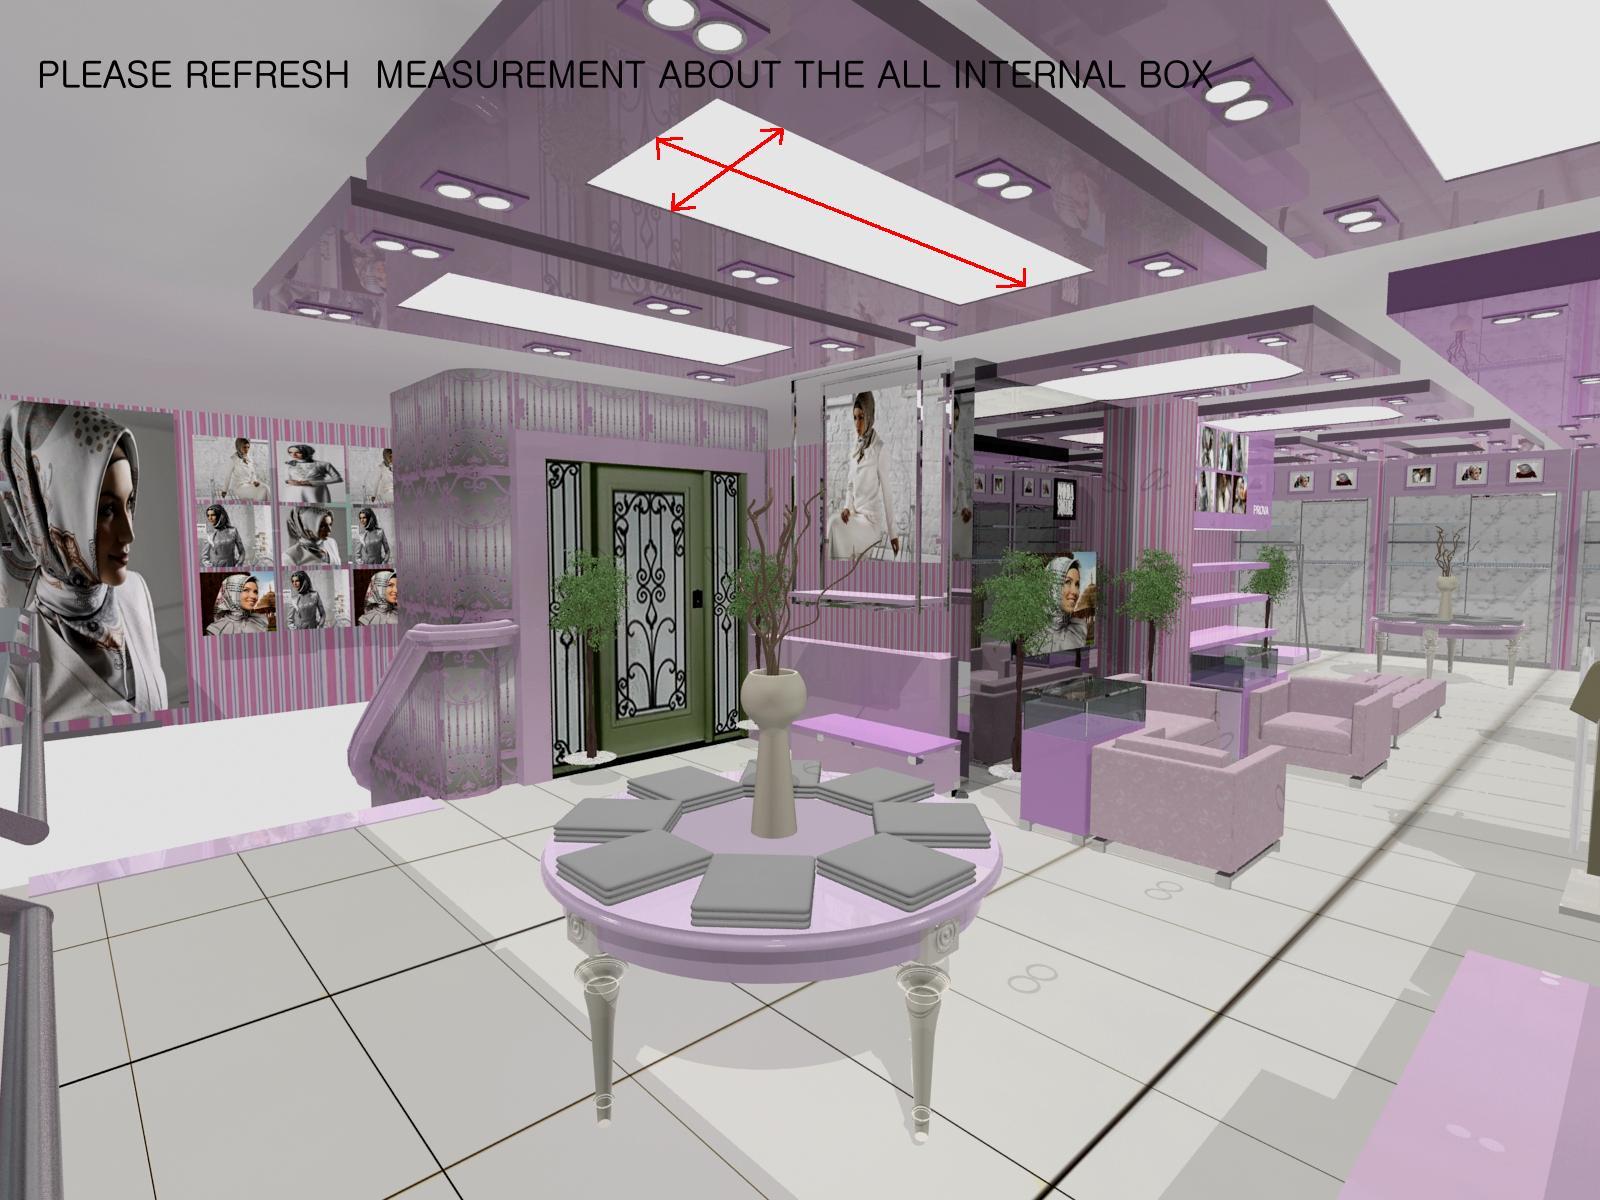 REFRESH-MEASUREMENT 1